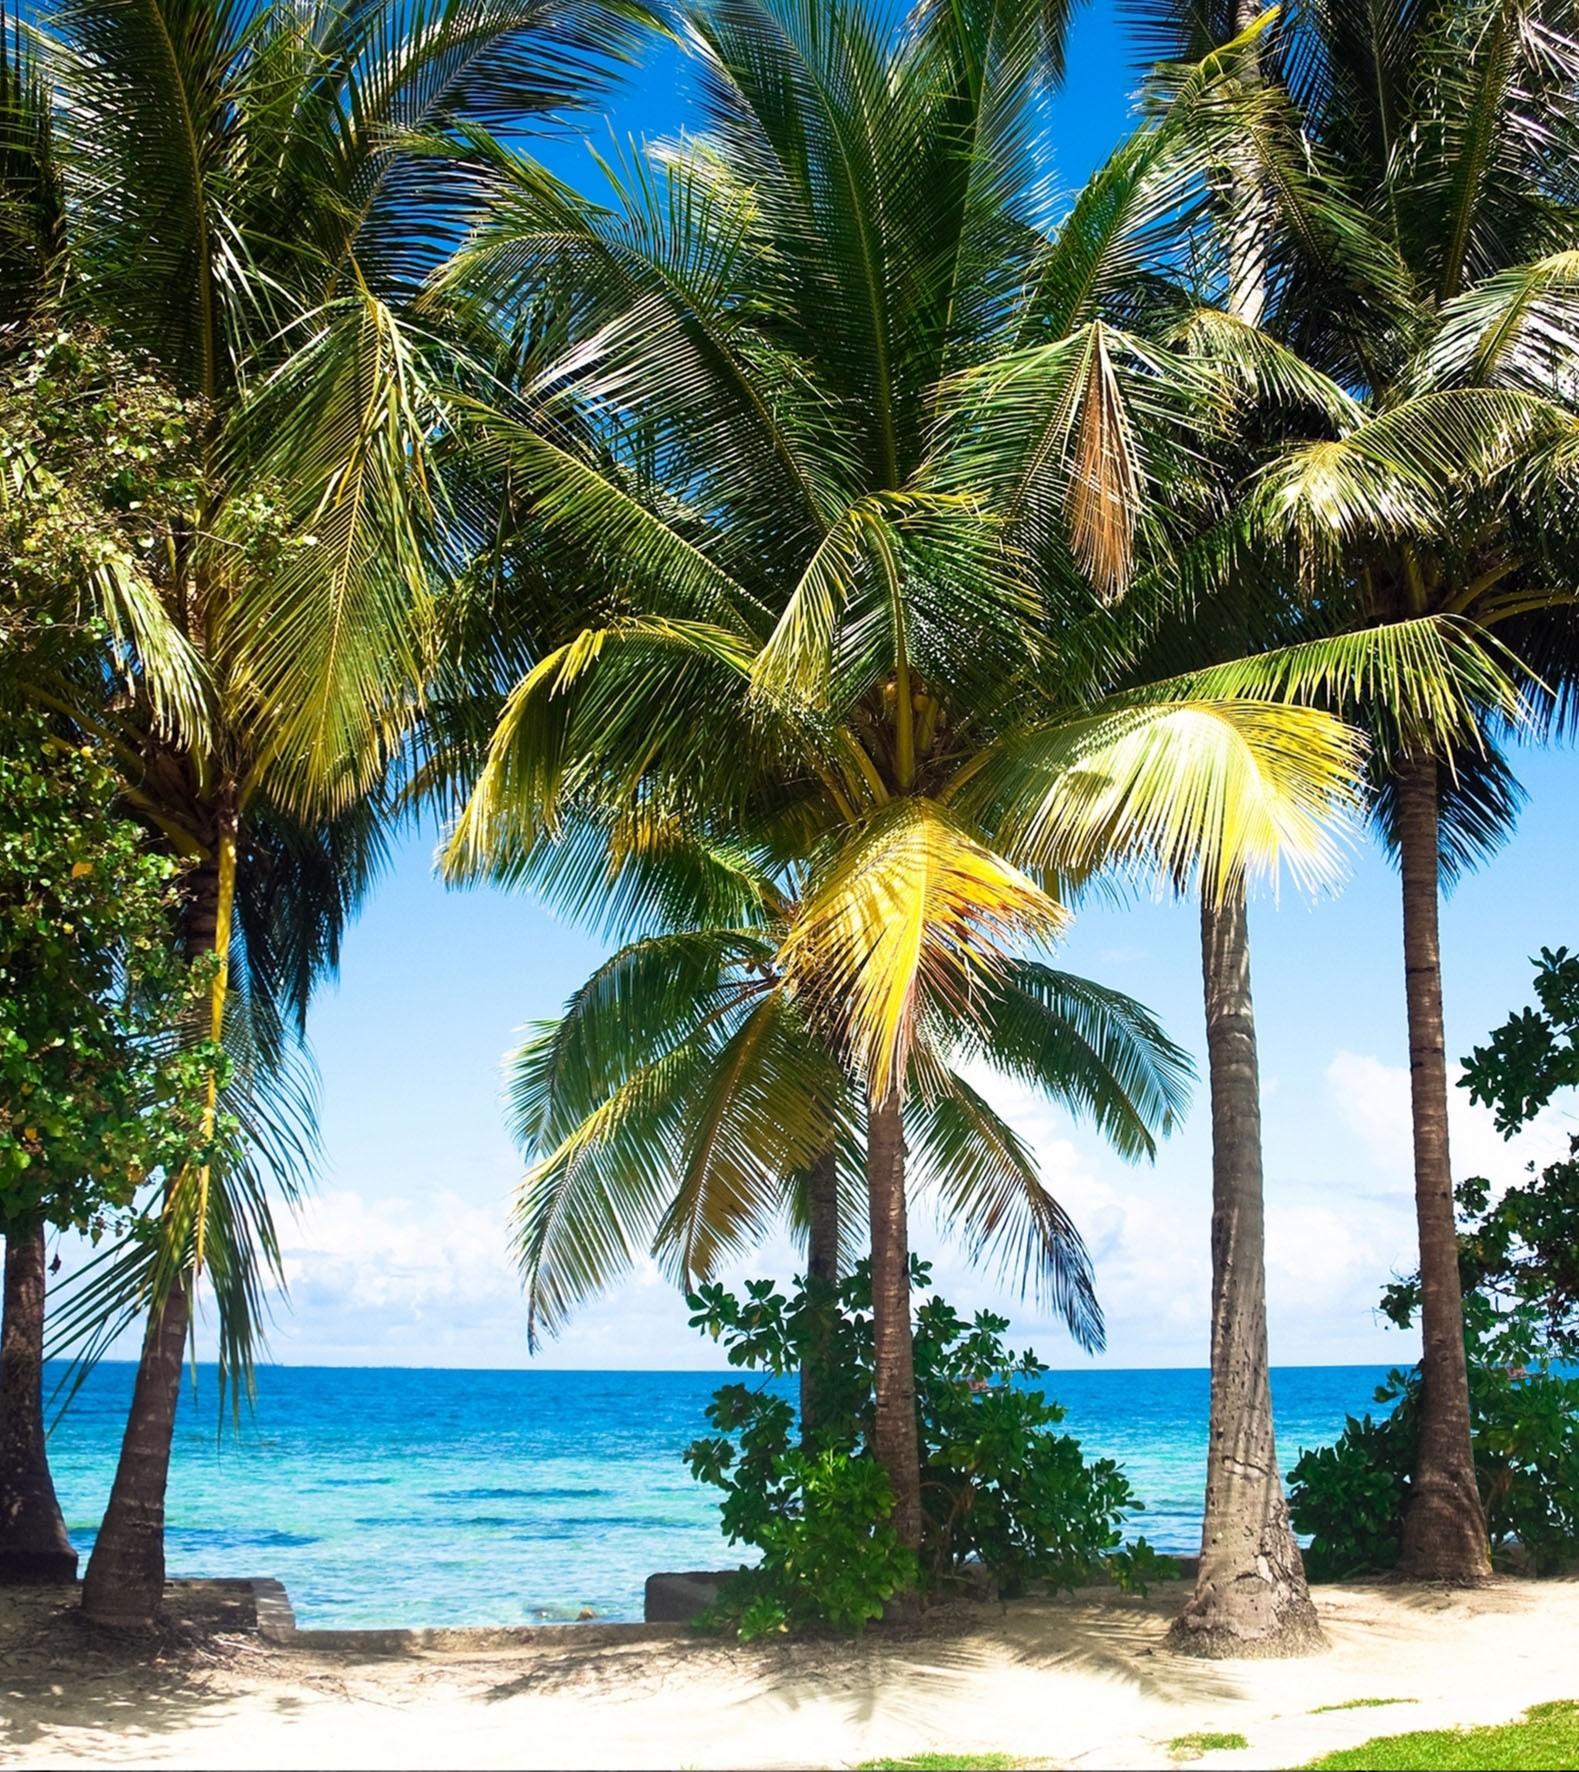 wandbild 180 x 202 cm 2 teilig kleister fototapete palmen insel strand meer. Black Bedroom Furniture Sets. Home Design Ideas